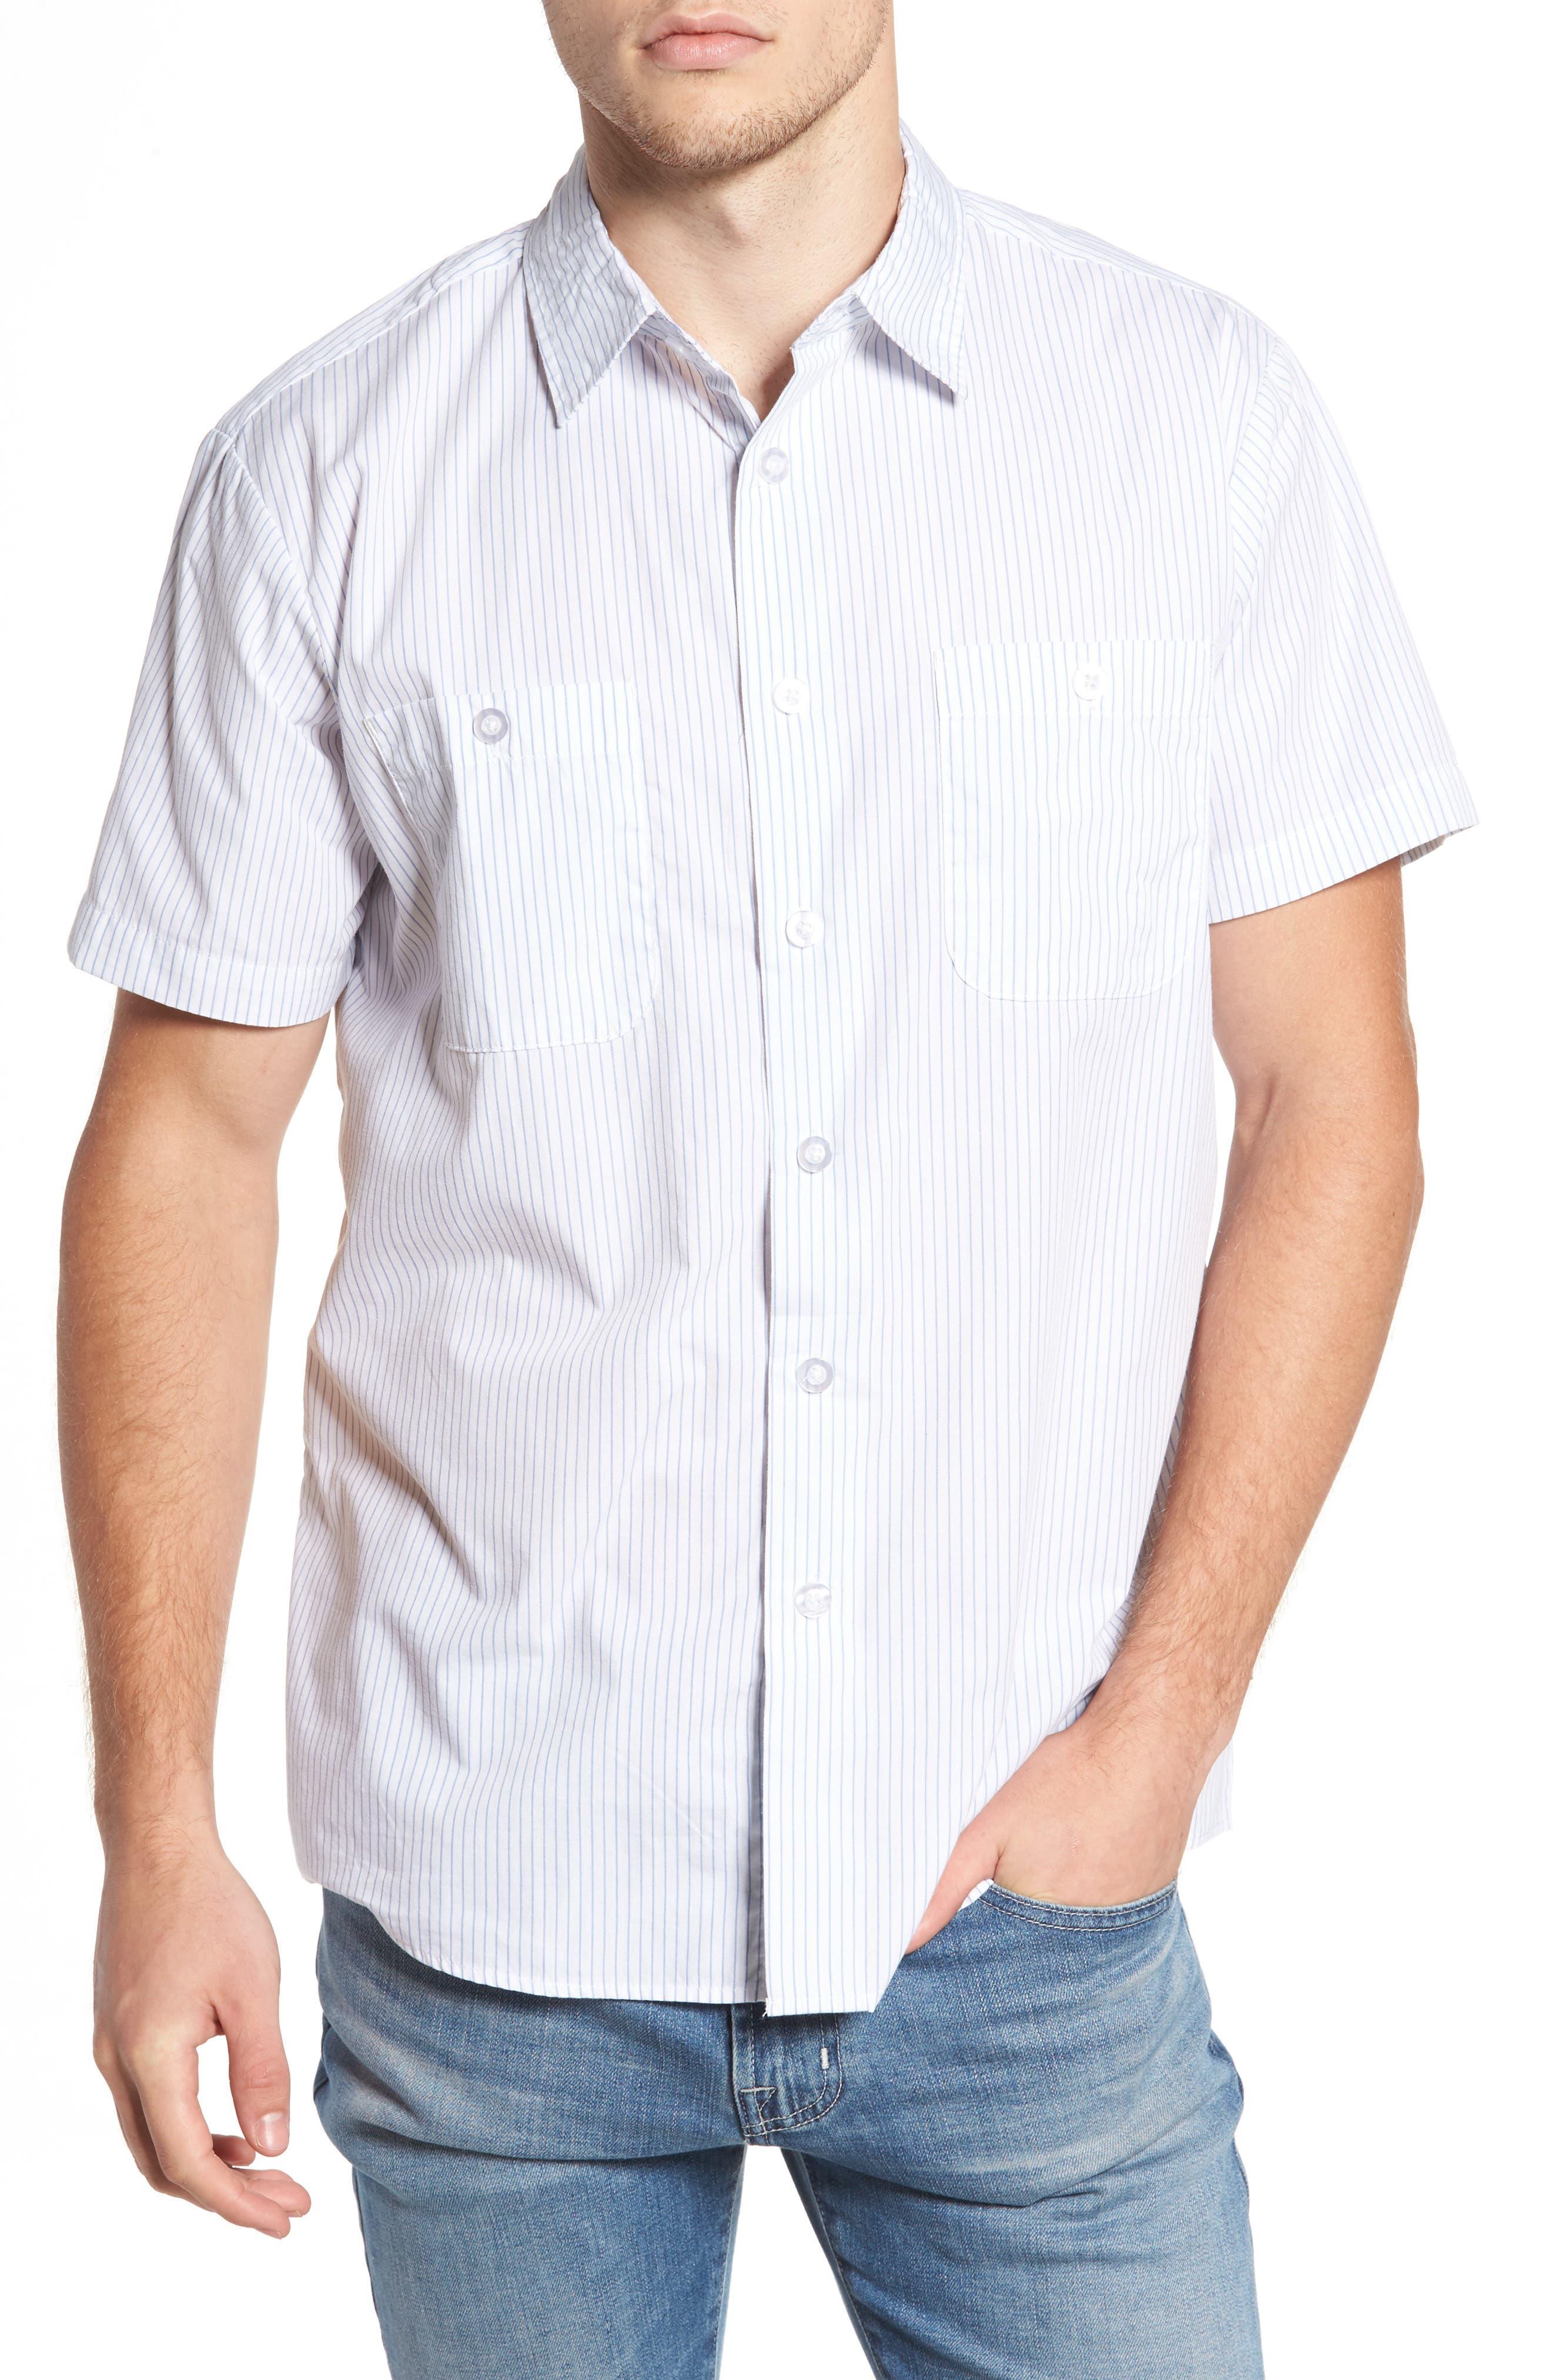 Reeve Pinstripe Woven Shirt,                             Main thumbnail 1, color,                             100